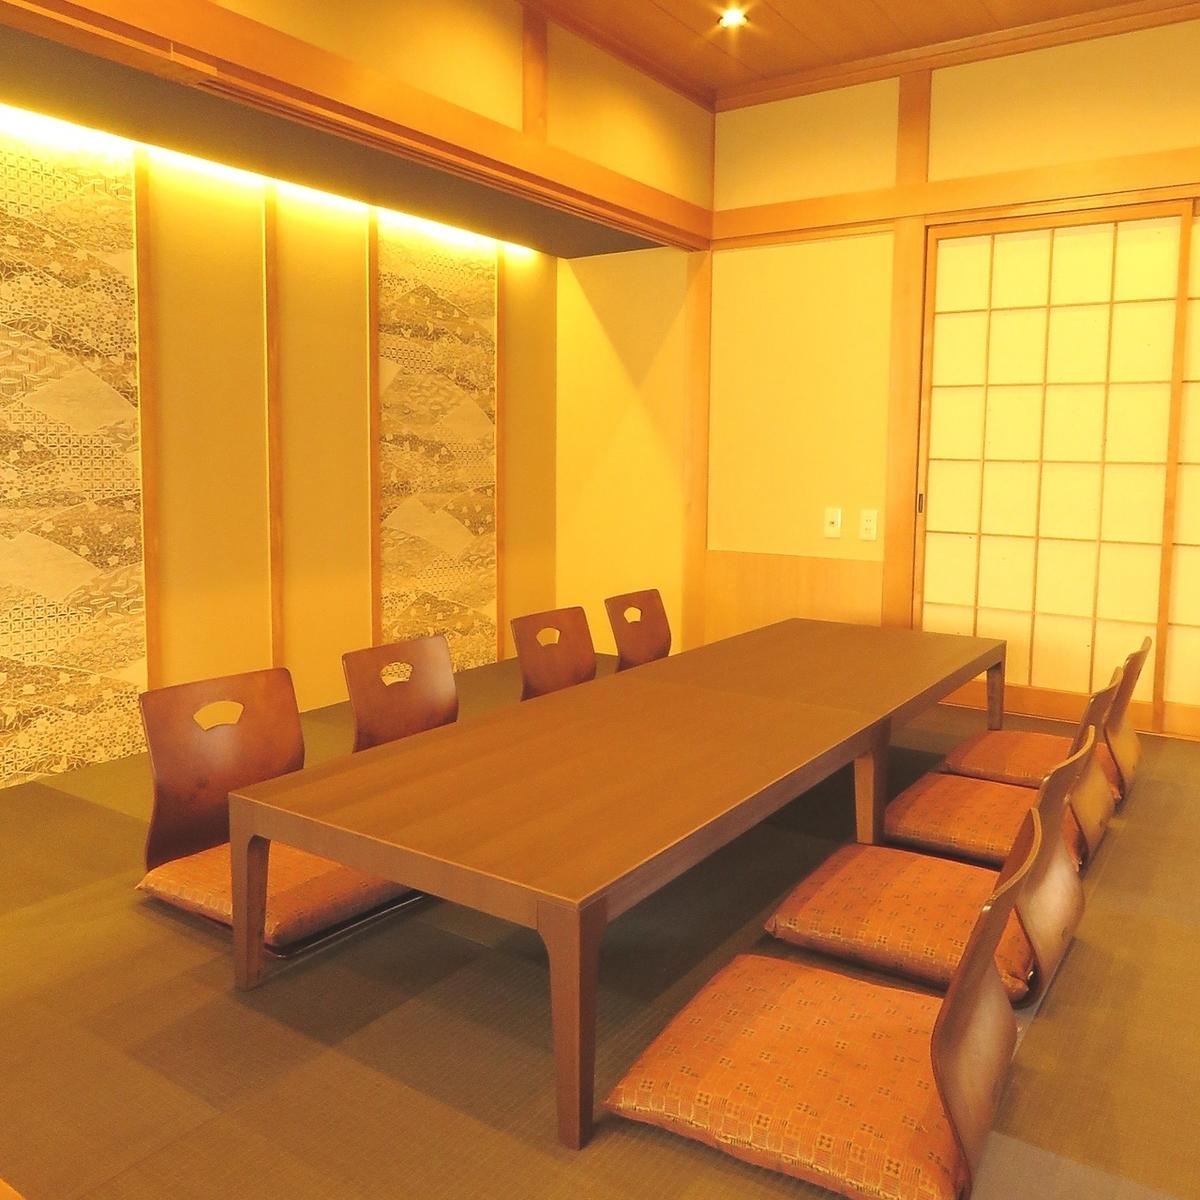 2nd floor: Osaki private room